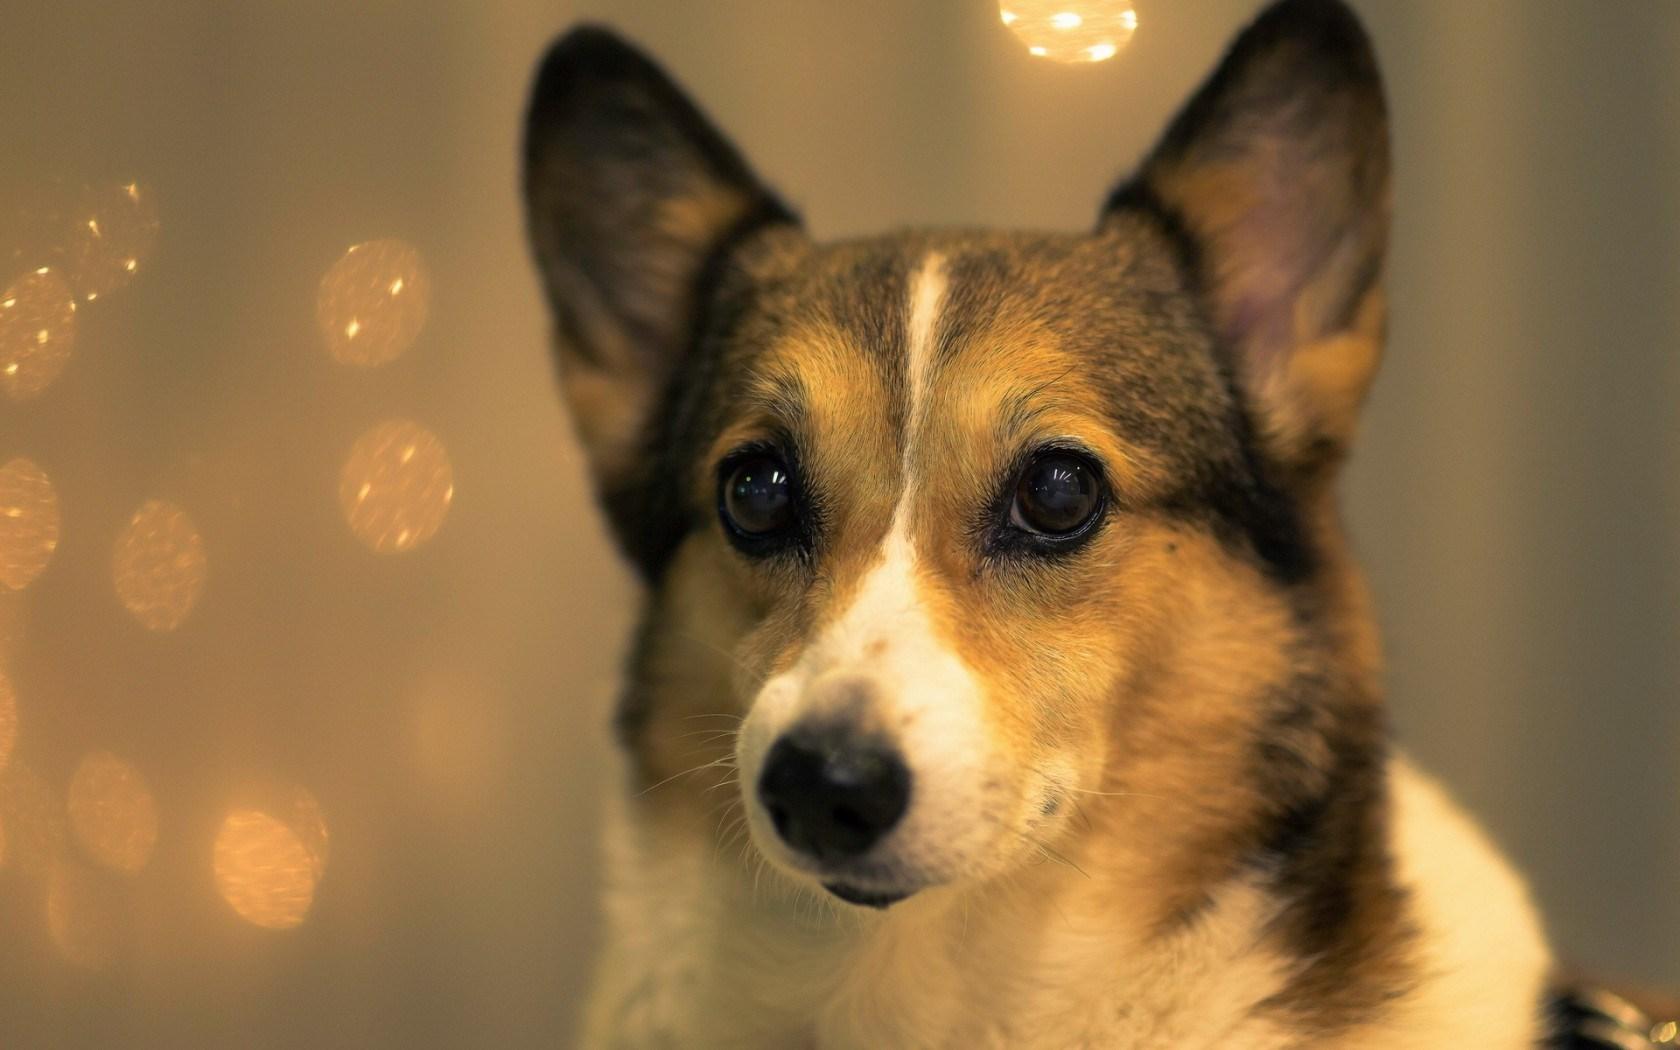 Live Wallpaper Fall Leaves Dog Licking Fawn Hd Desktop Wallpapers 4k Hd